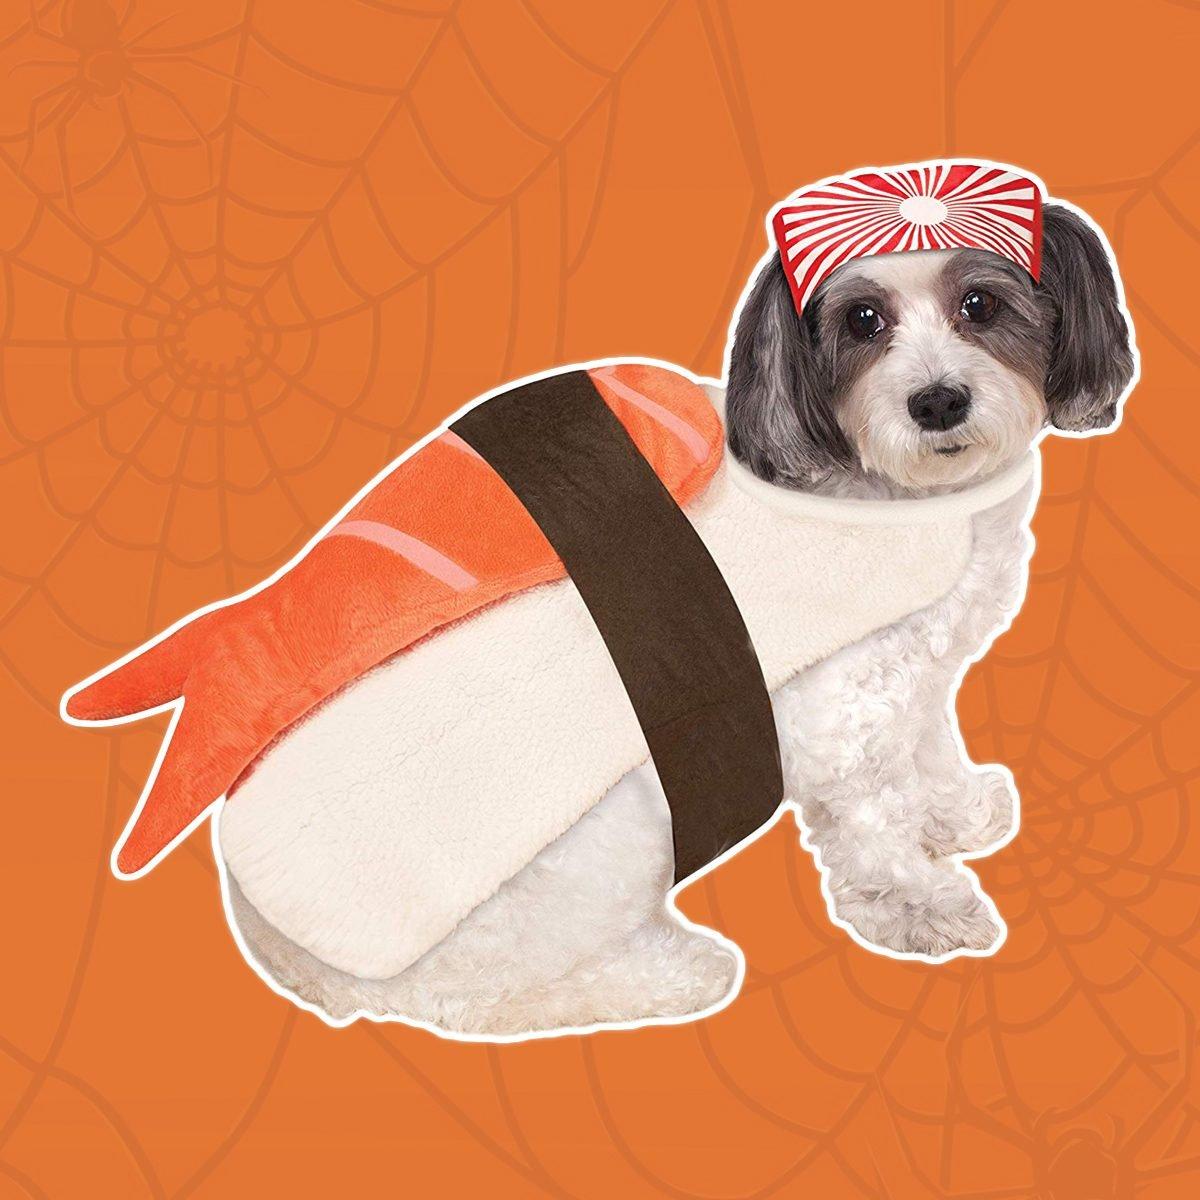 Sushi puppy